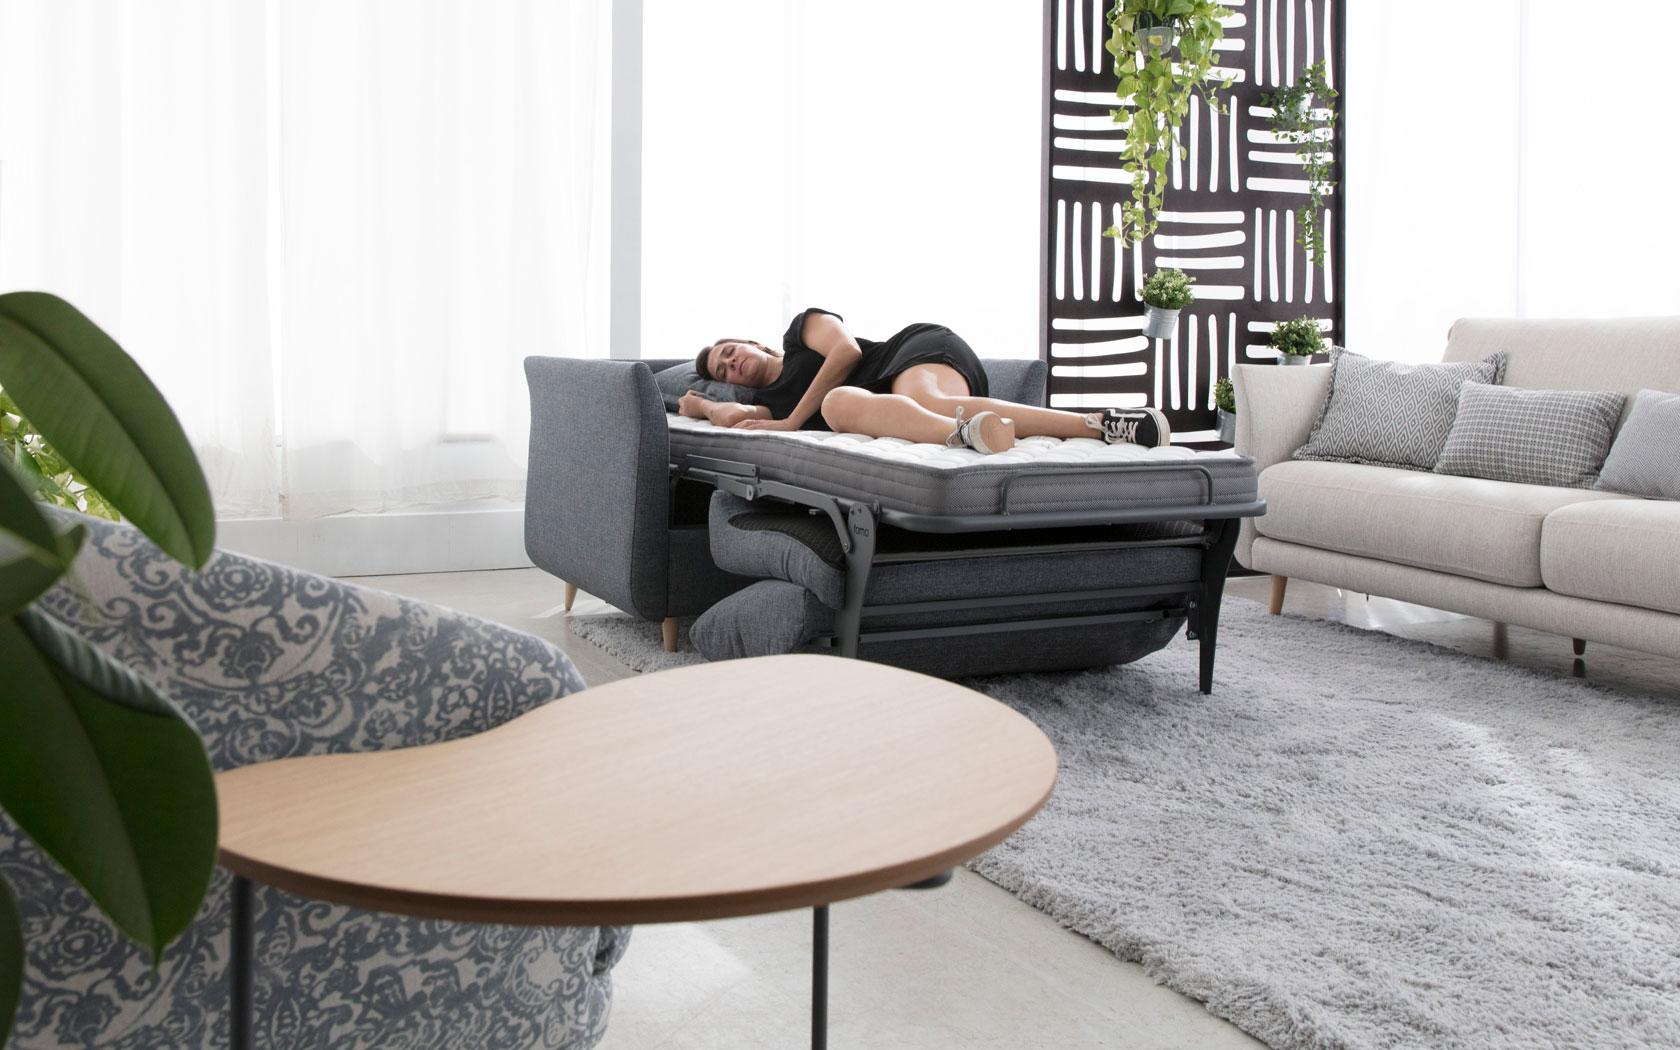 Helsinki sillón cama 2020 09